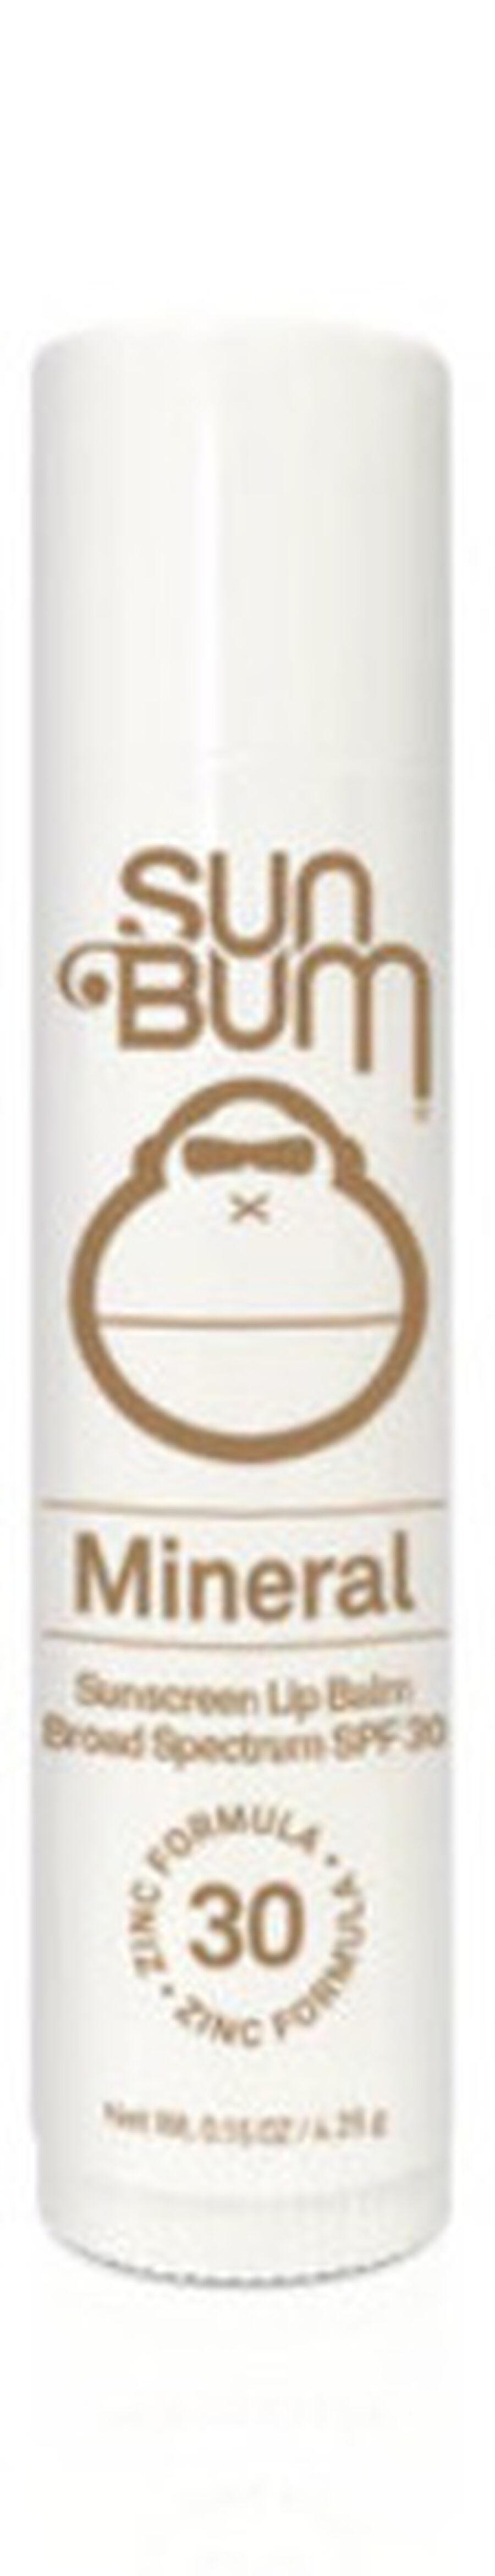 Sun Bum Mineral Lip Balm SPF 30, .15 oz, , large image number 0